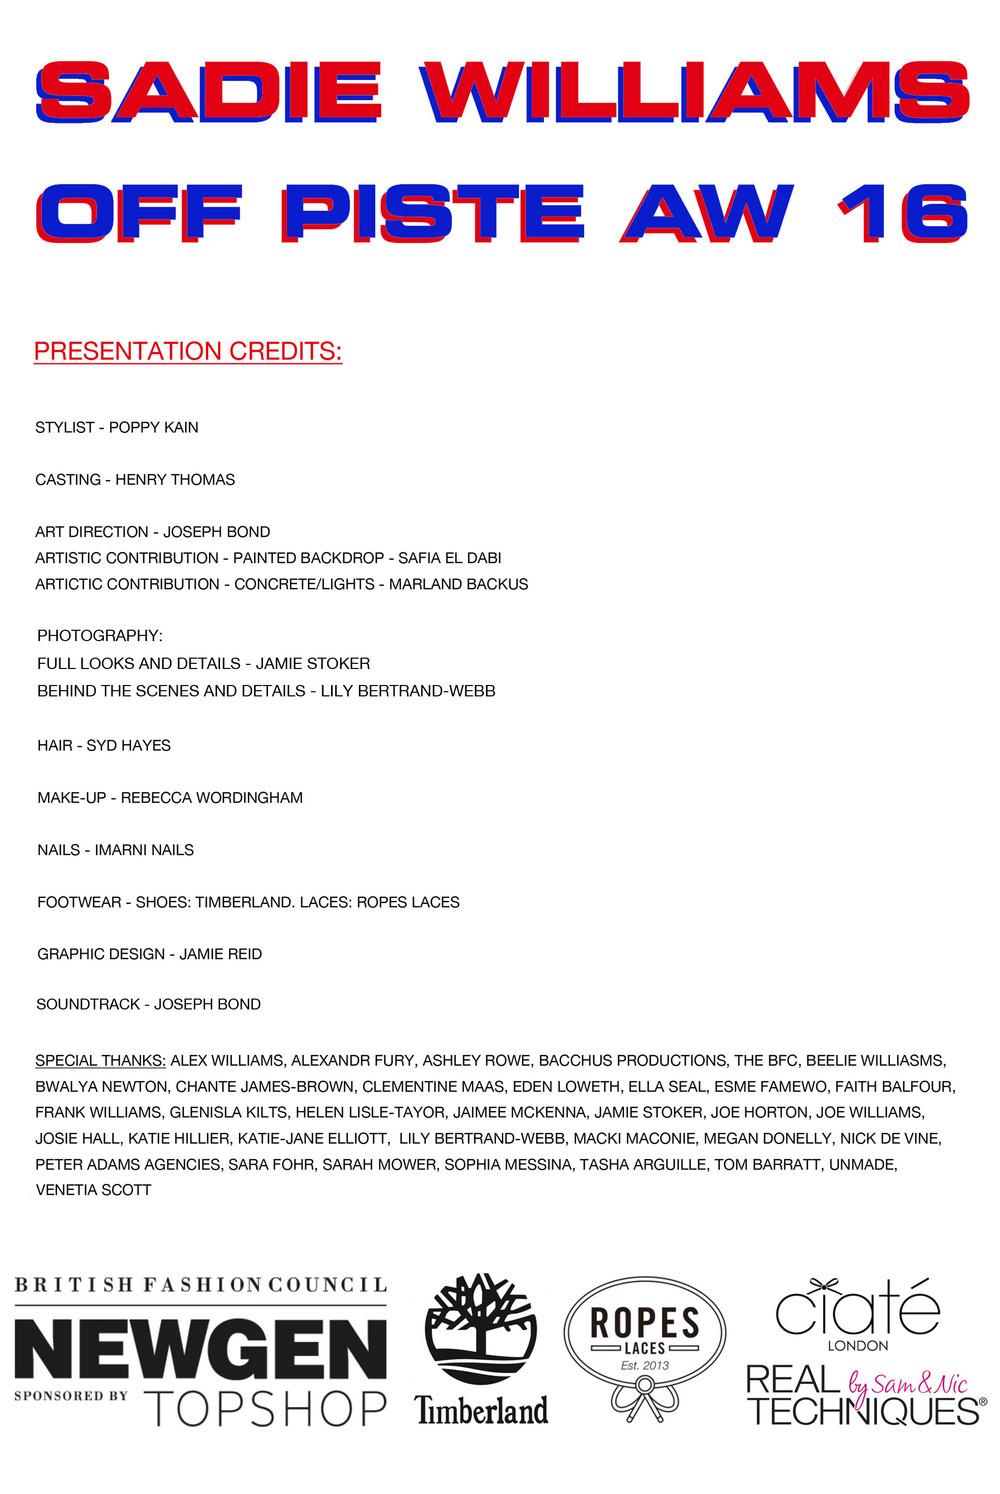 SADIE WILLIAMS 'OFF PISTE' PRESENTATION CREDITS